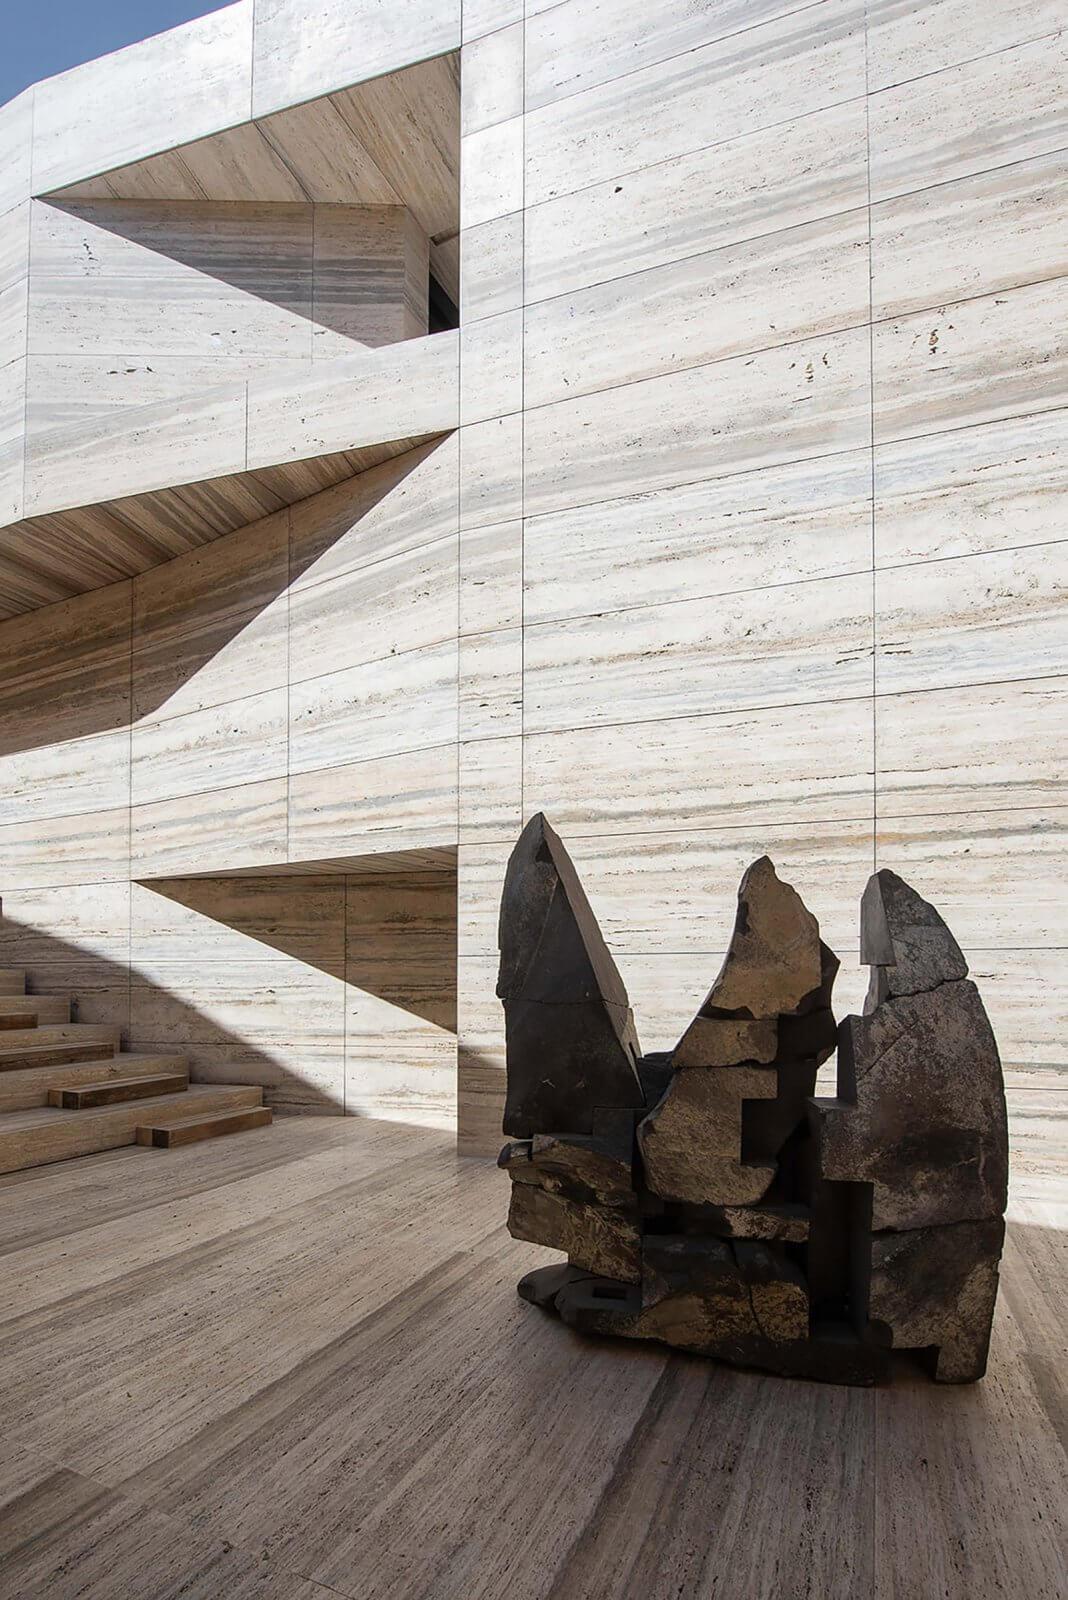 Museo ARCA  - 3.3 Jaime Navarro 2268 41